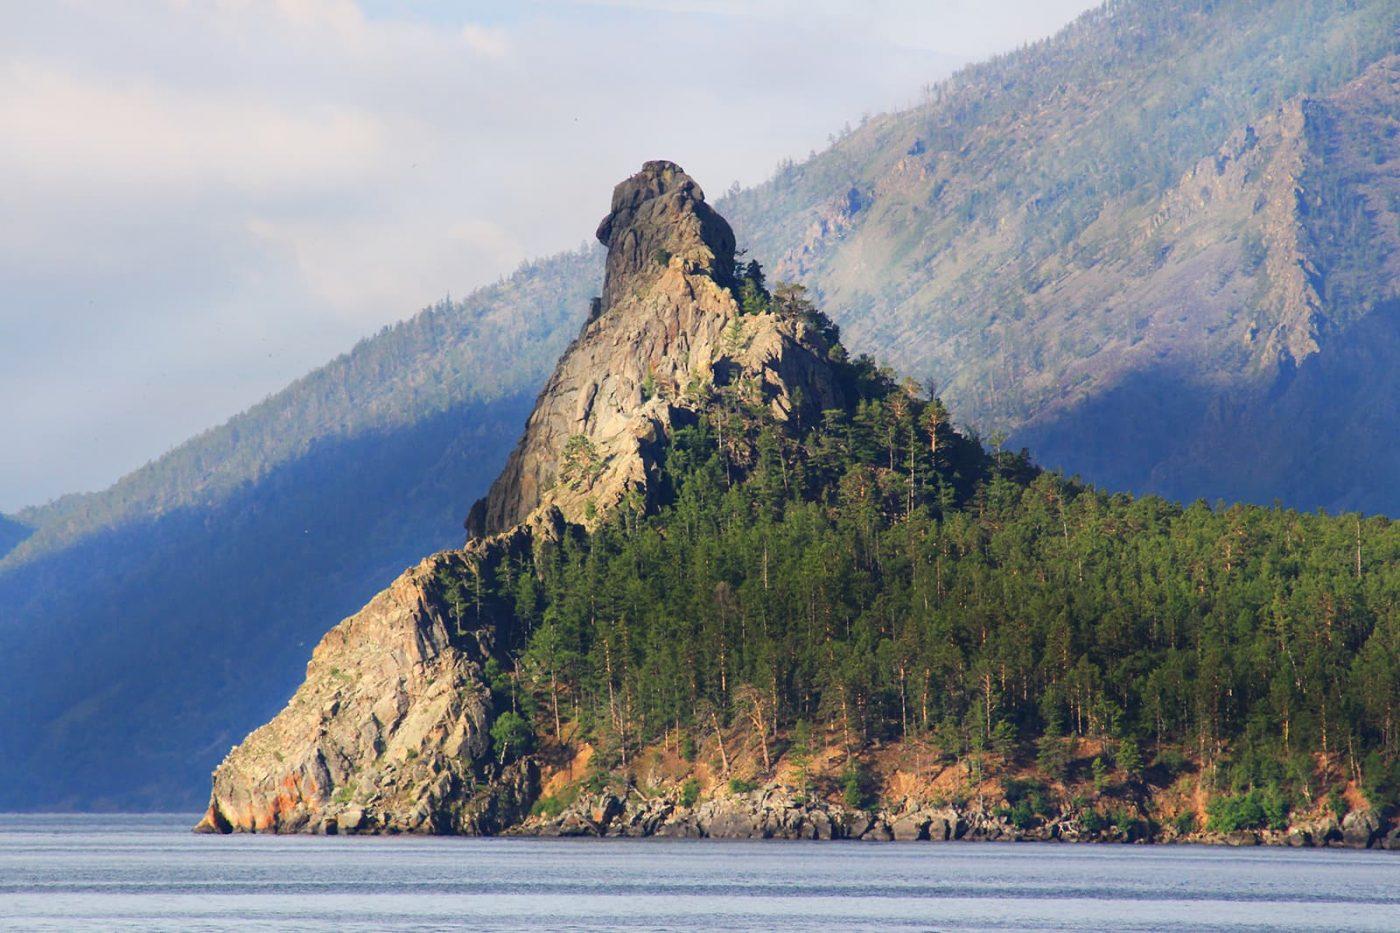 Trash Free National Parks: the Pribaikalsky National Park